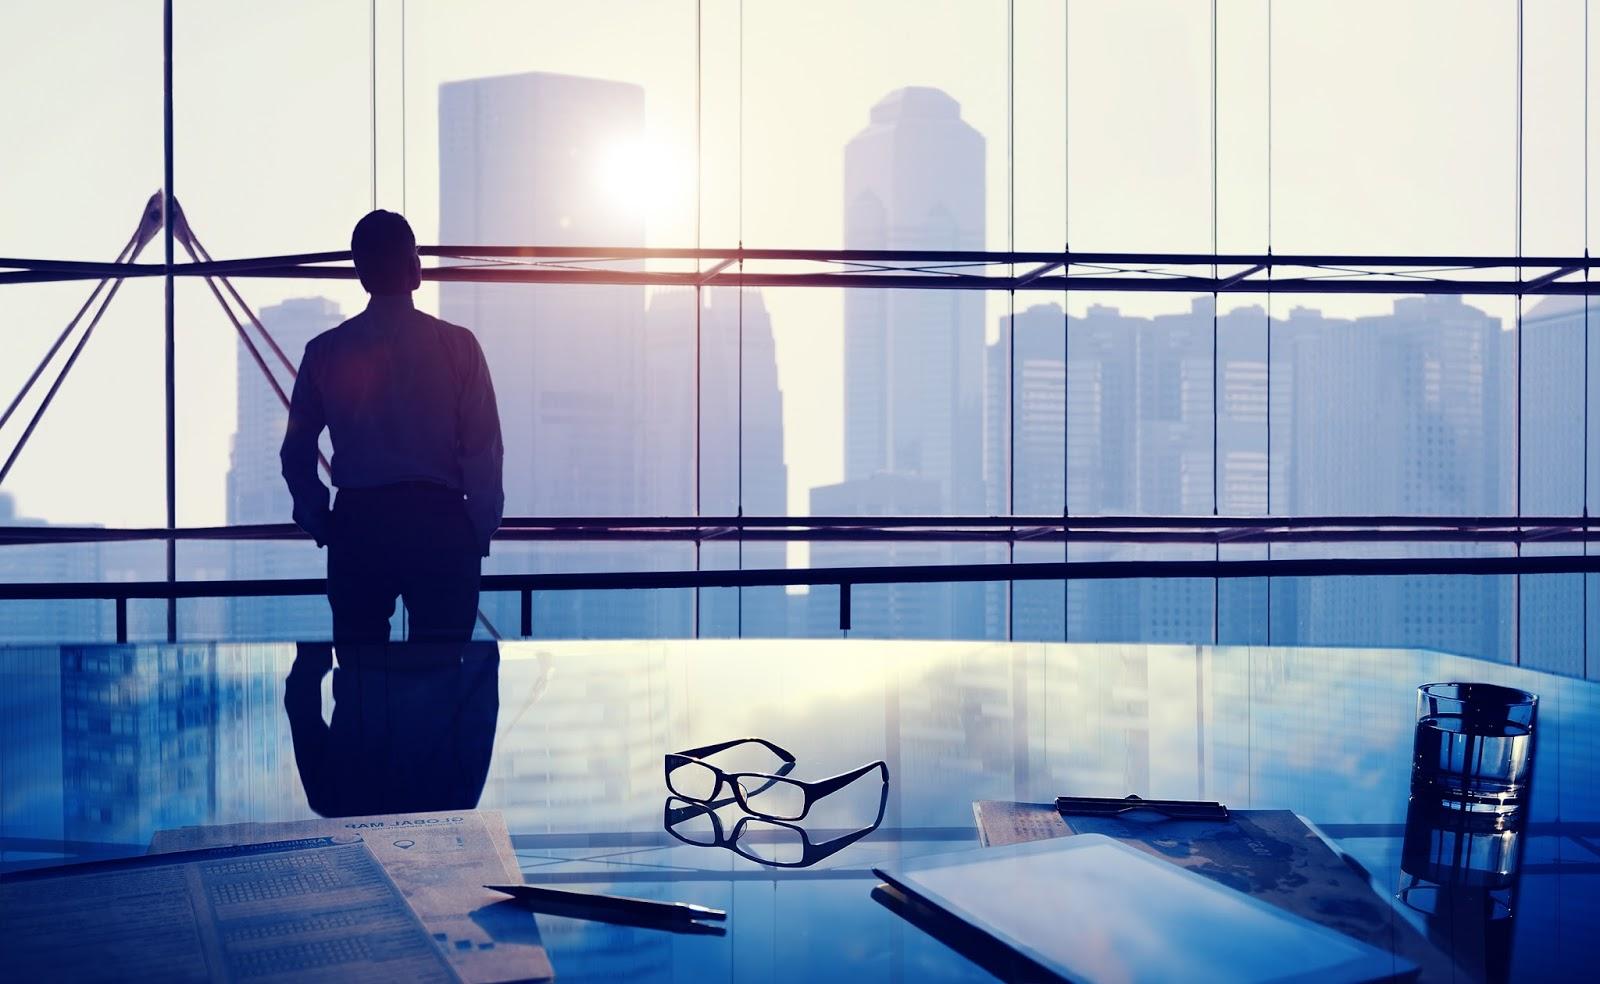 12 objetivos que debes lograr para convertirte en un empresario exitoso